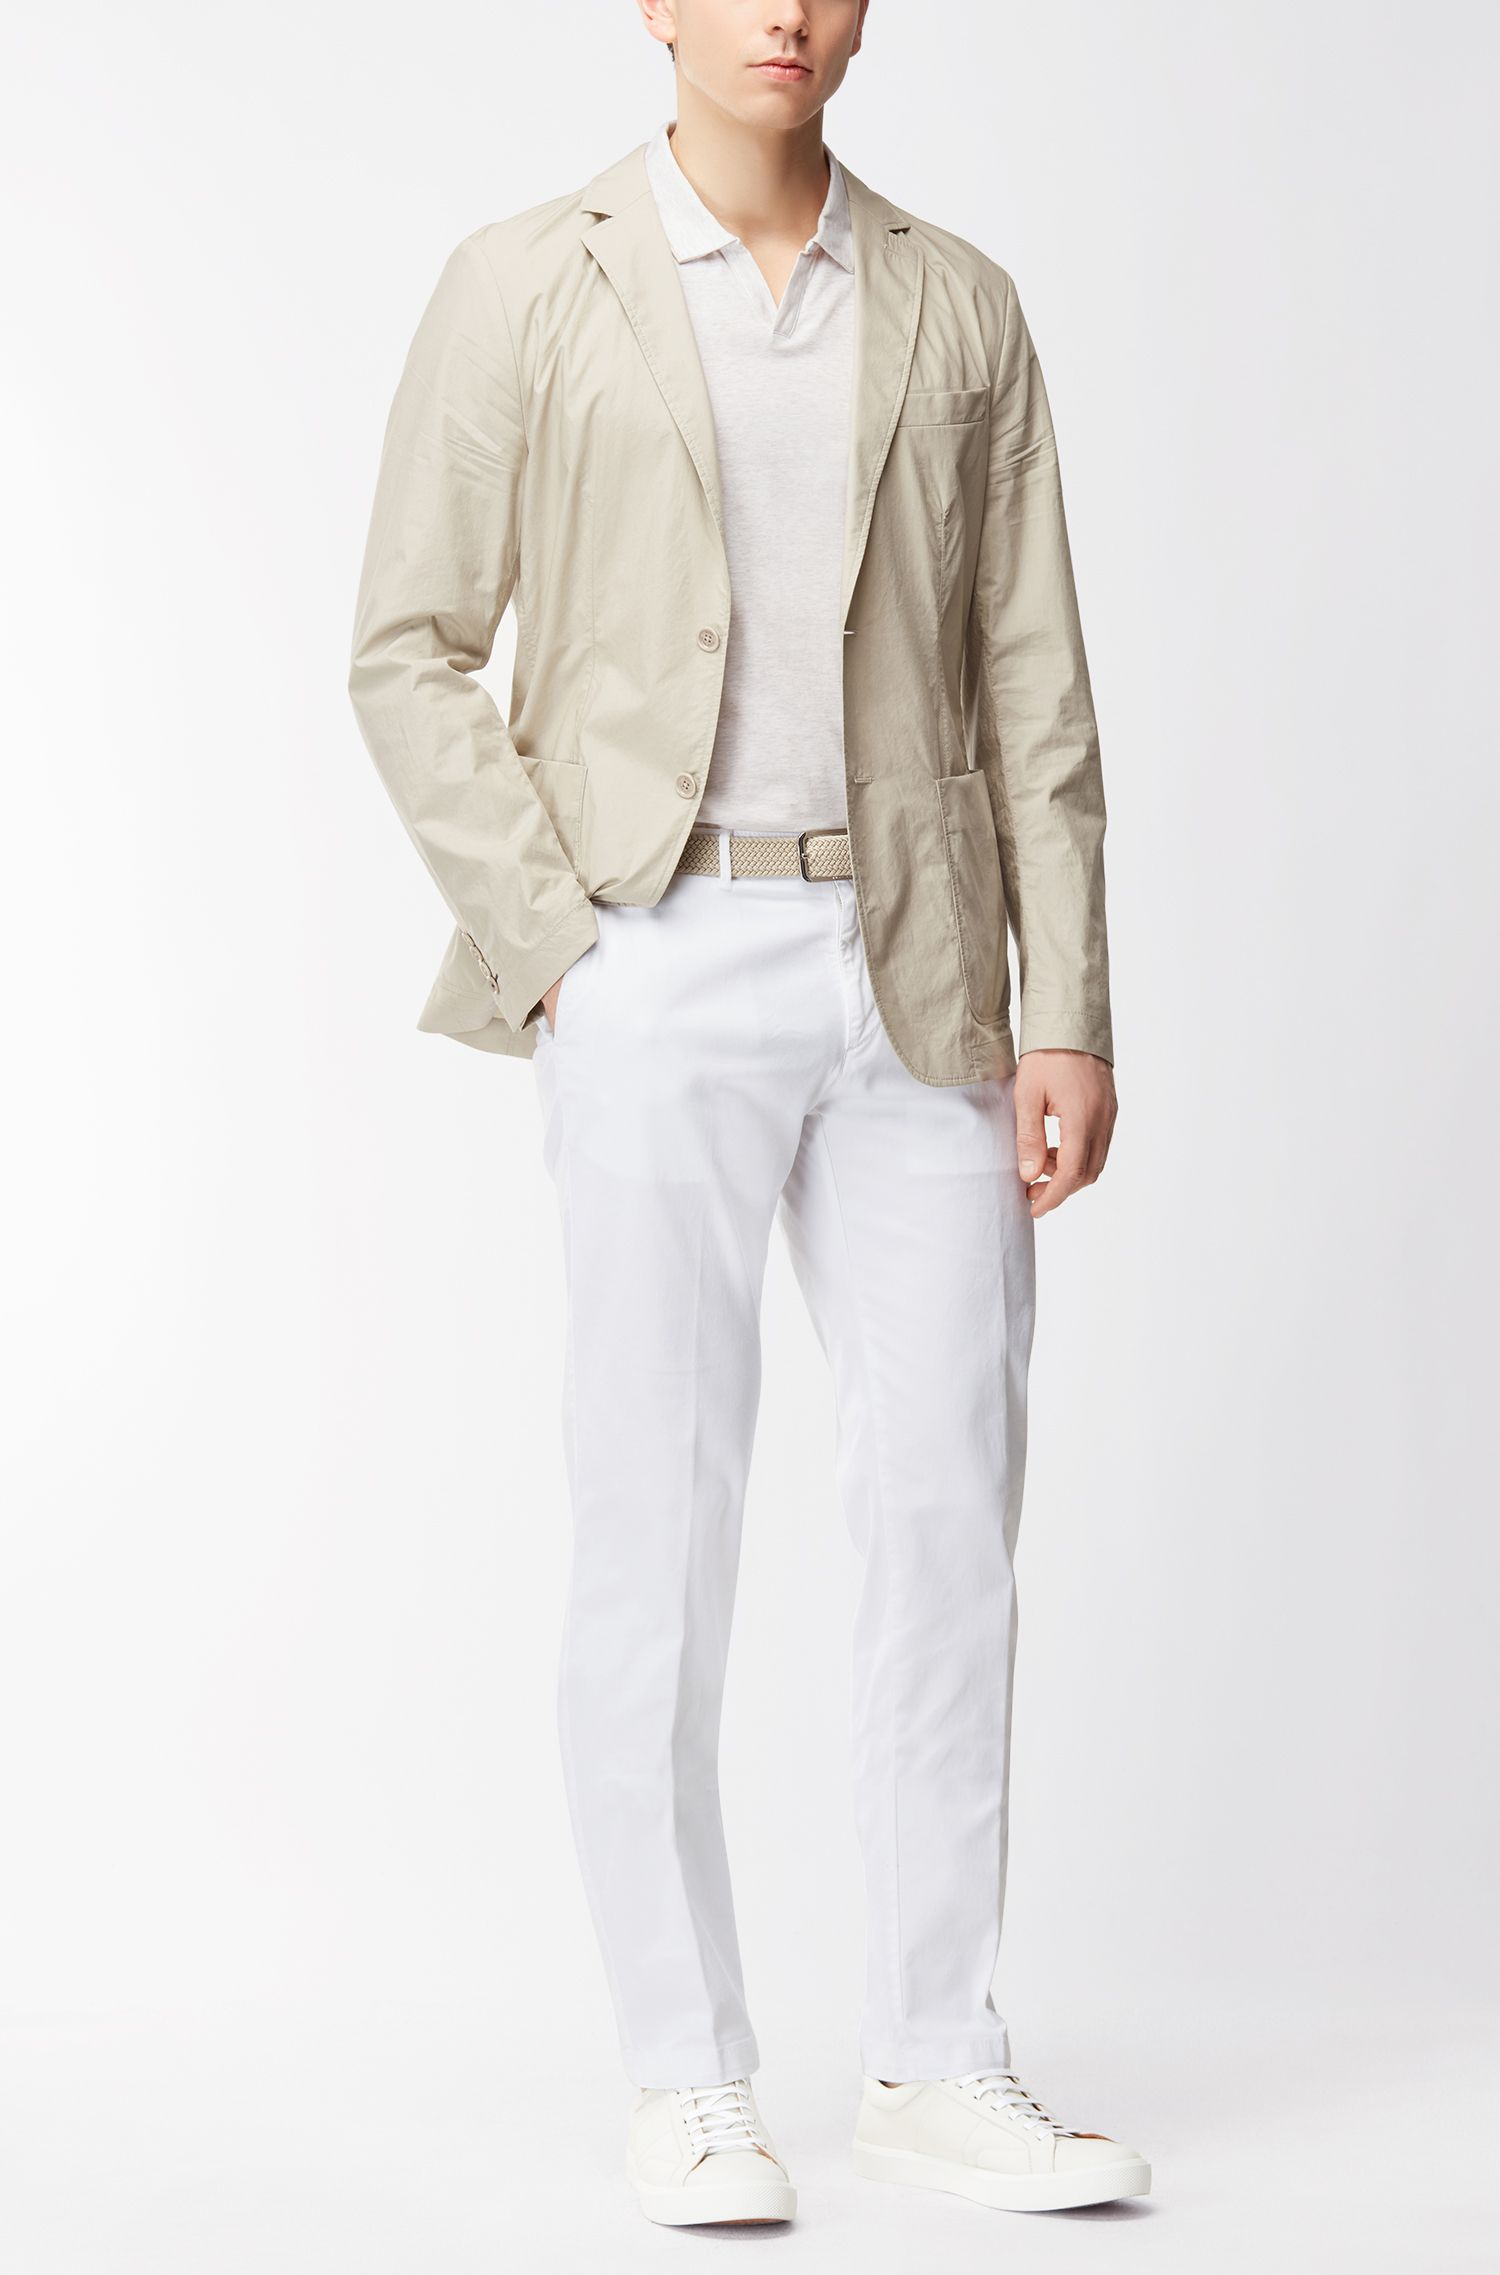 Cotton Linen Polo Shirt, Slim Fit | Plato, Natural